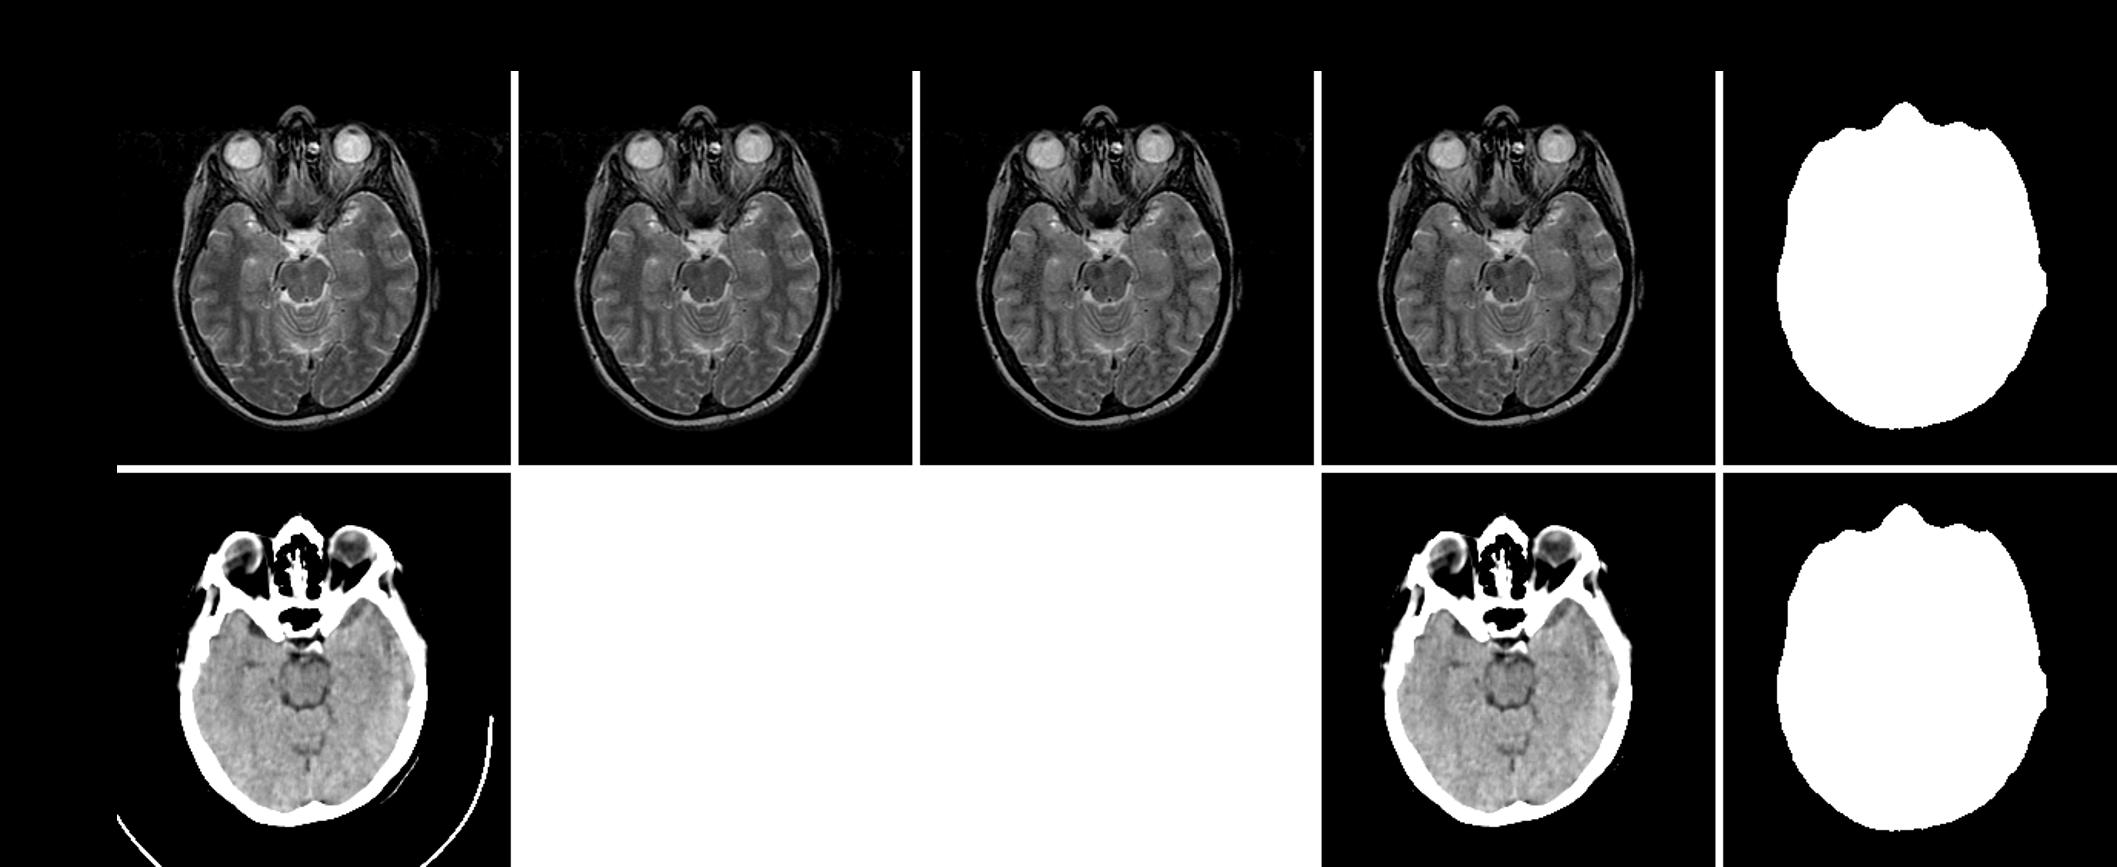 GitHub - ChengBinJin/MRI-to-CT-DCNN-TensorFlow: This repository is